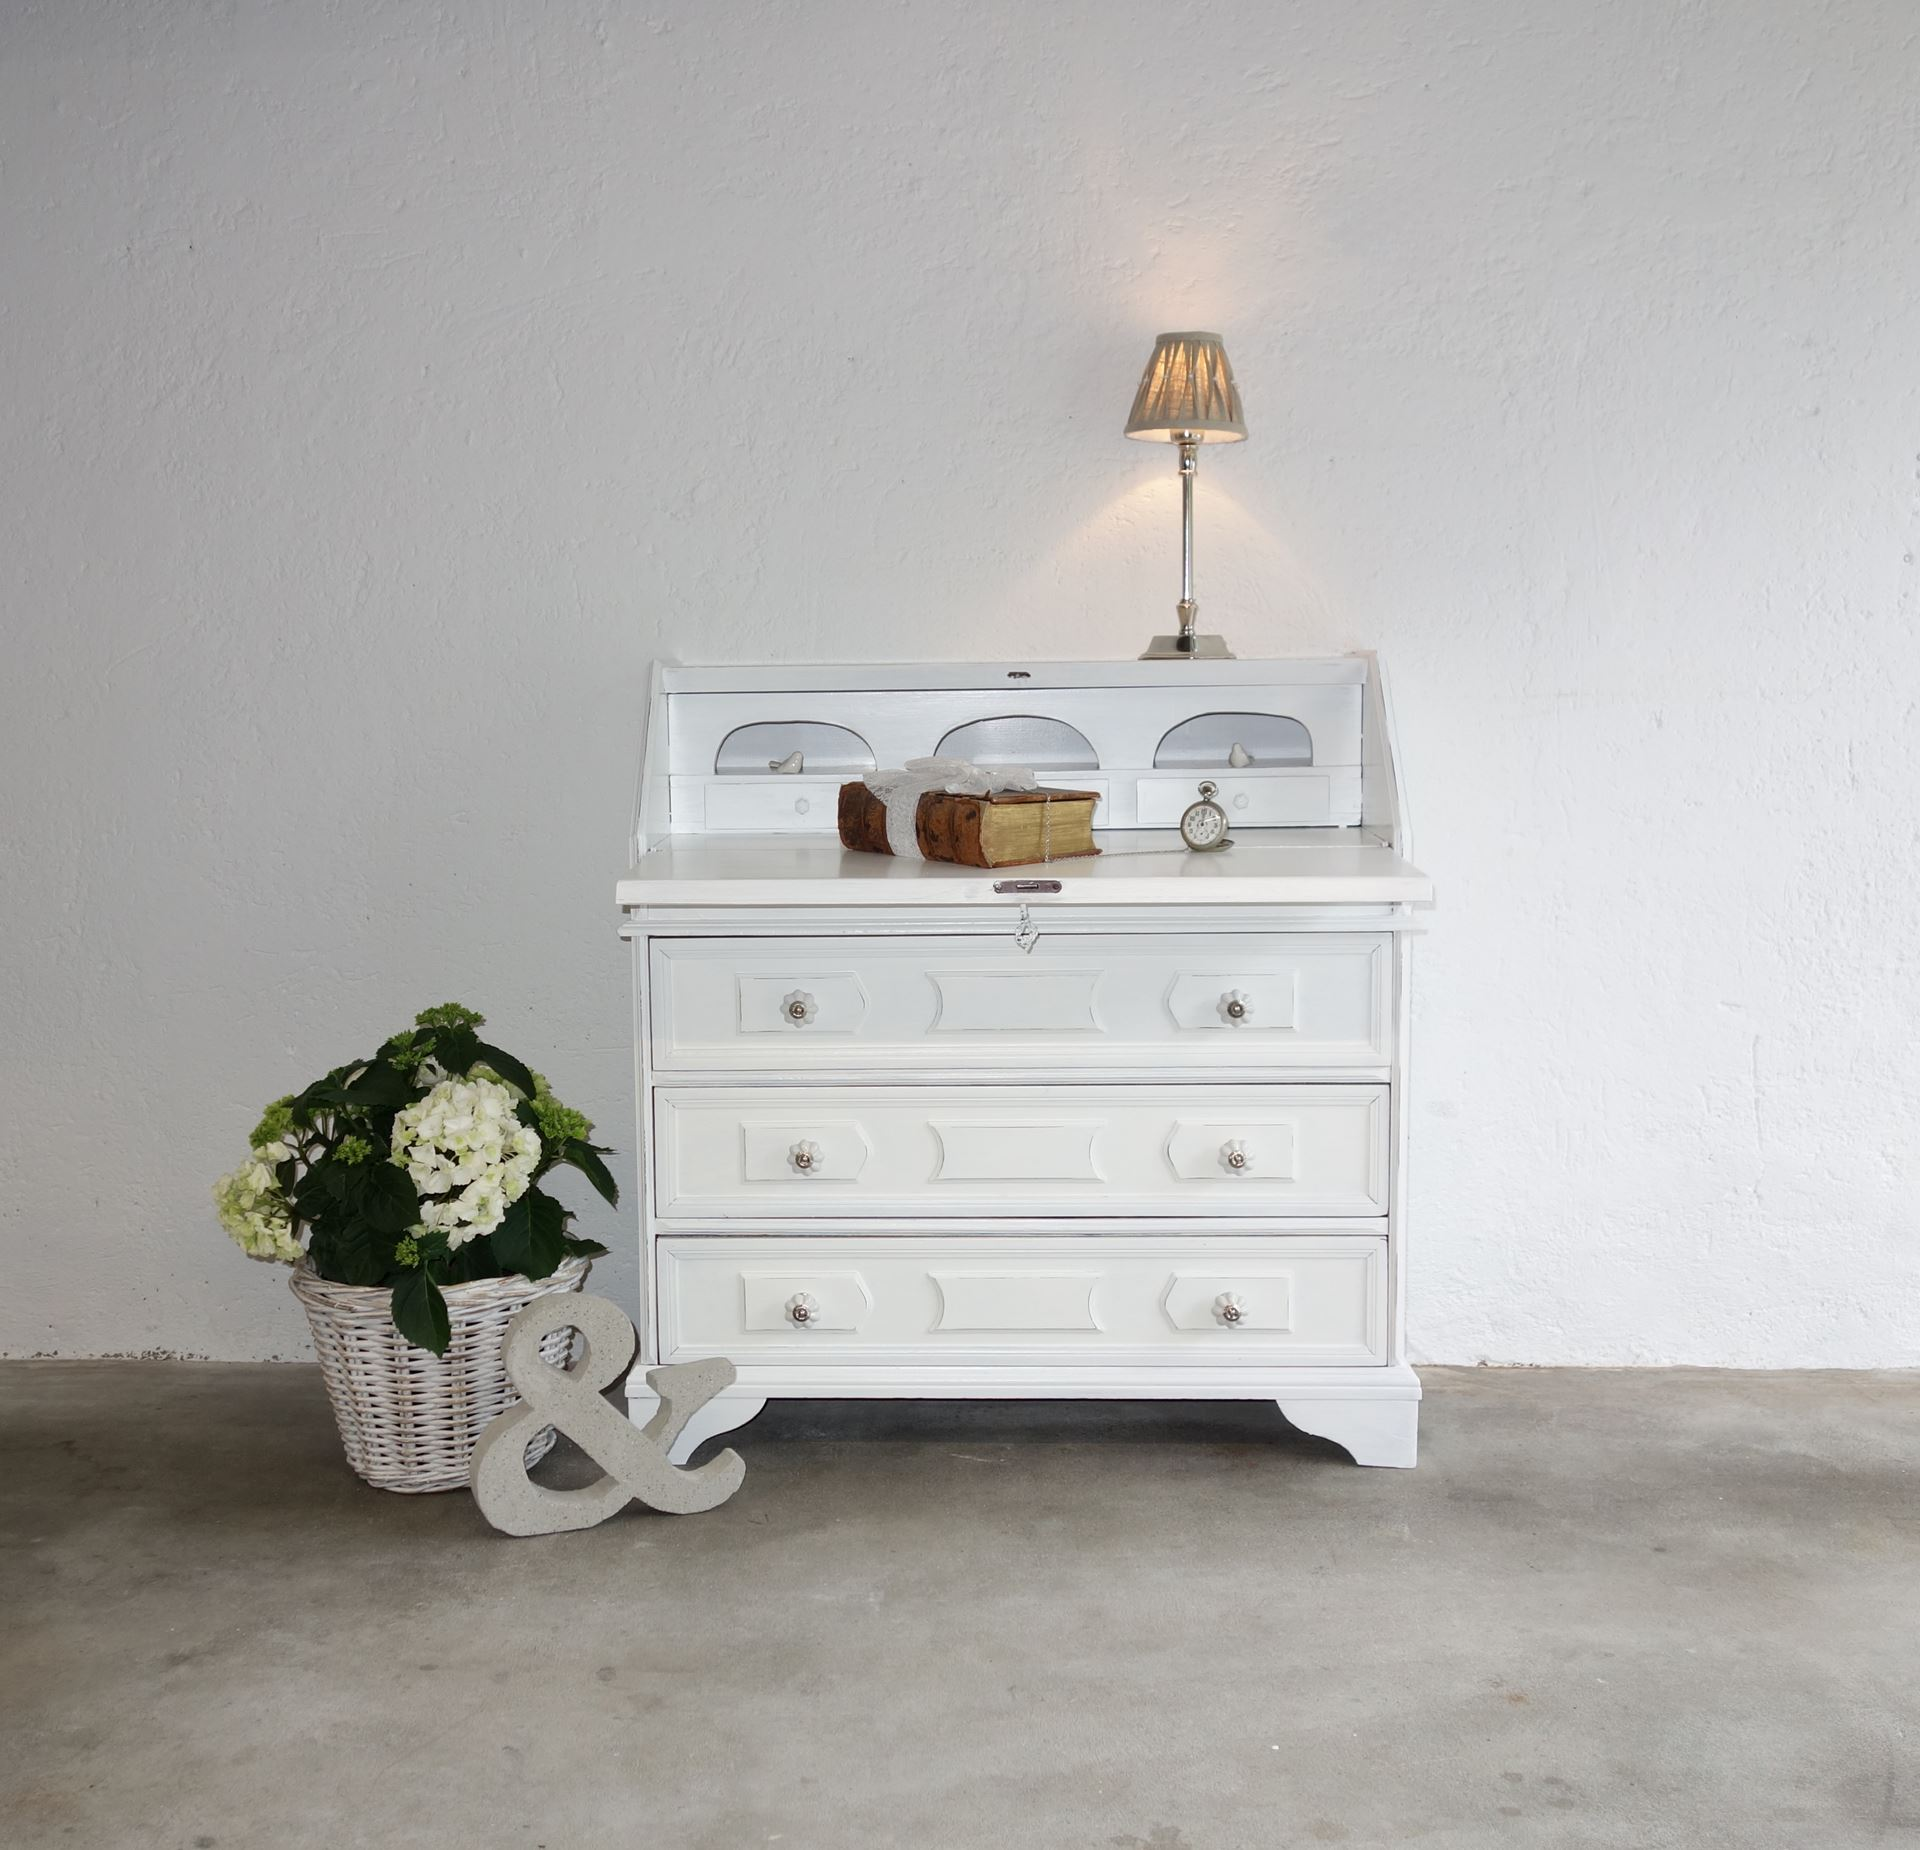 shabbyllity sekret r im shabby chic stil. Black Bedroom Furniture Sets. Home Design Ideas